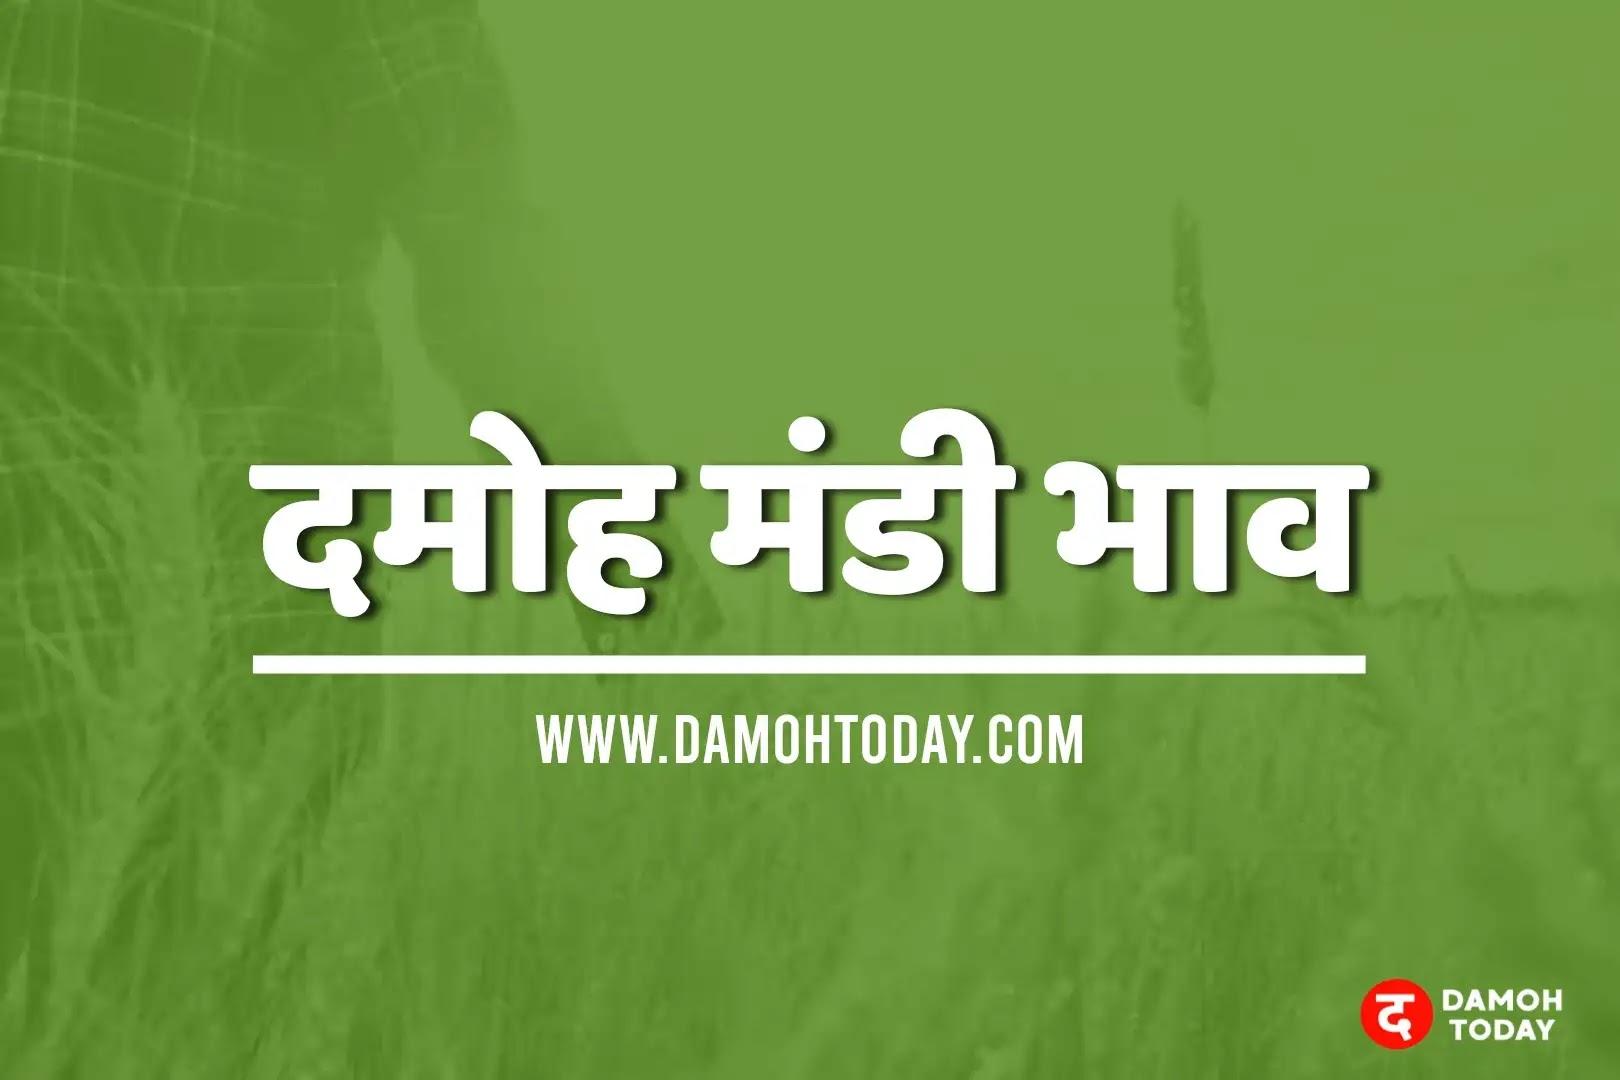 damoh mandi bhav today